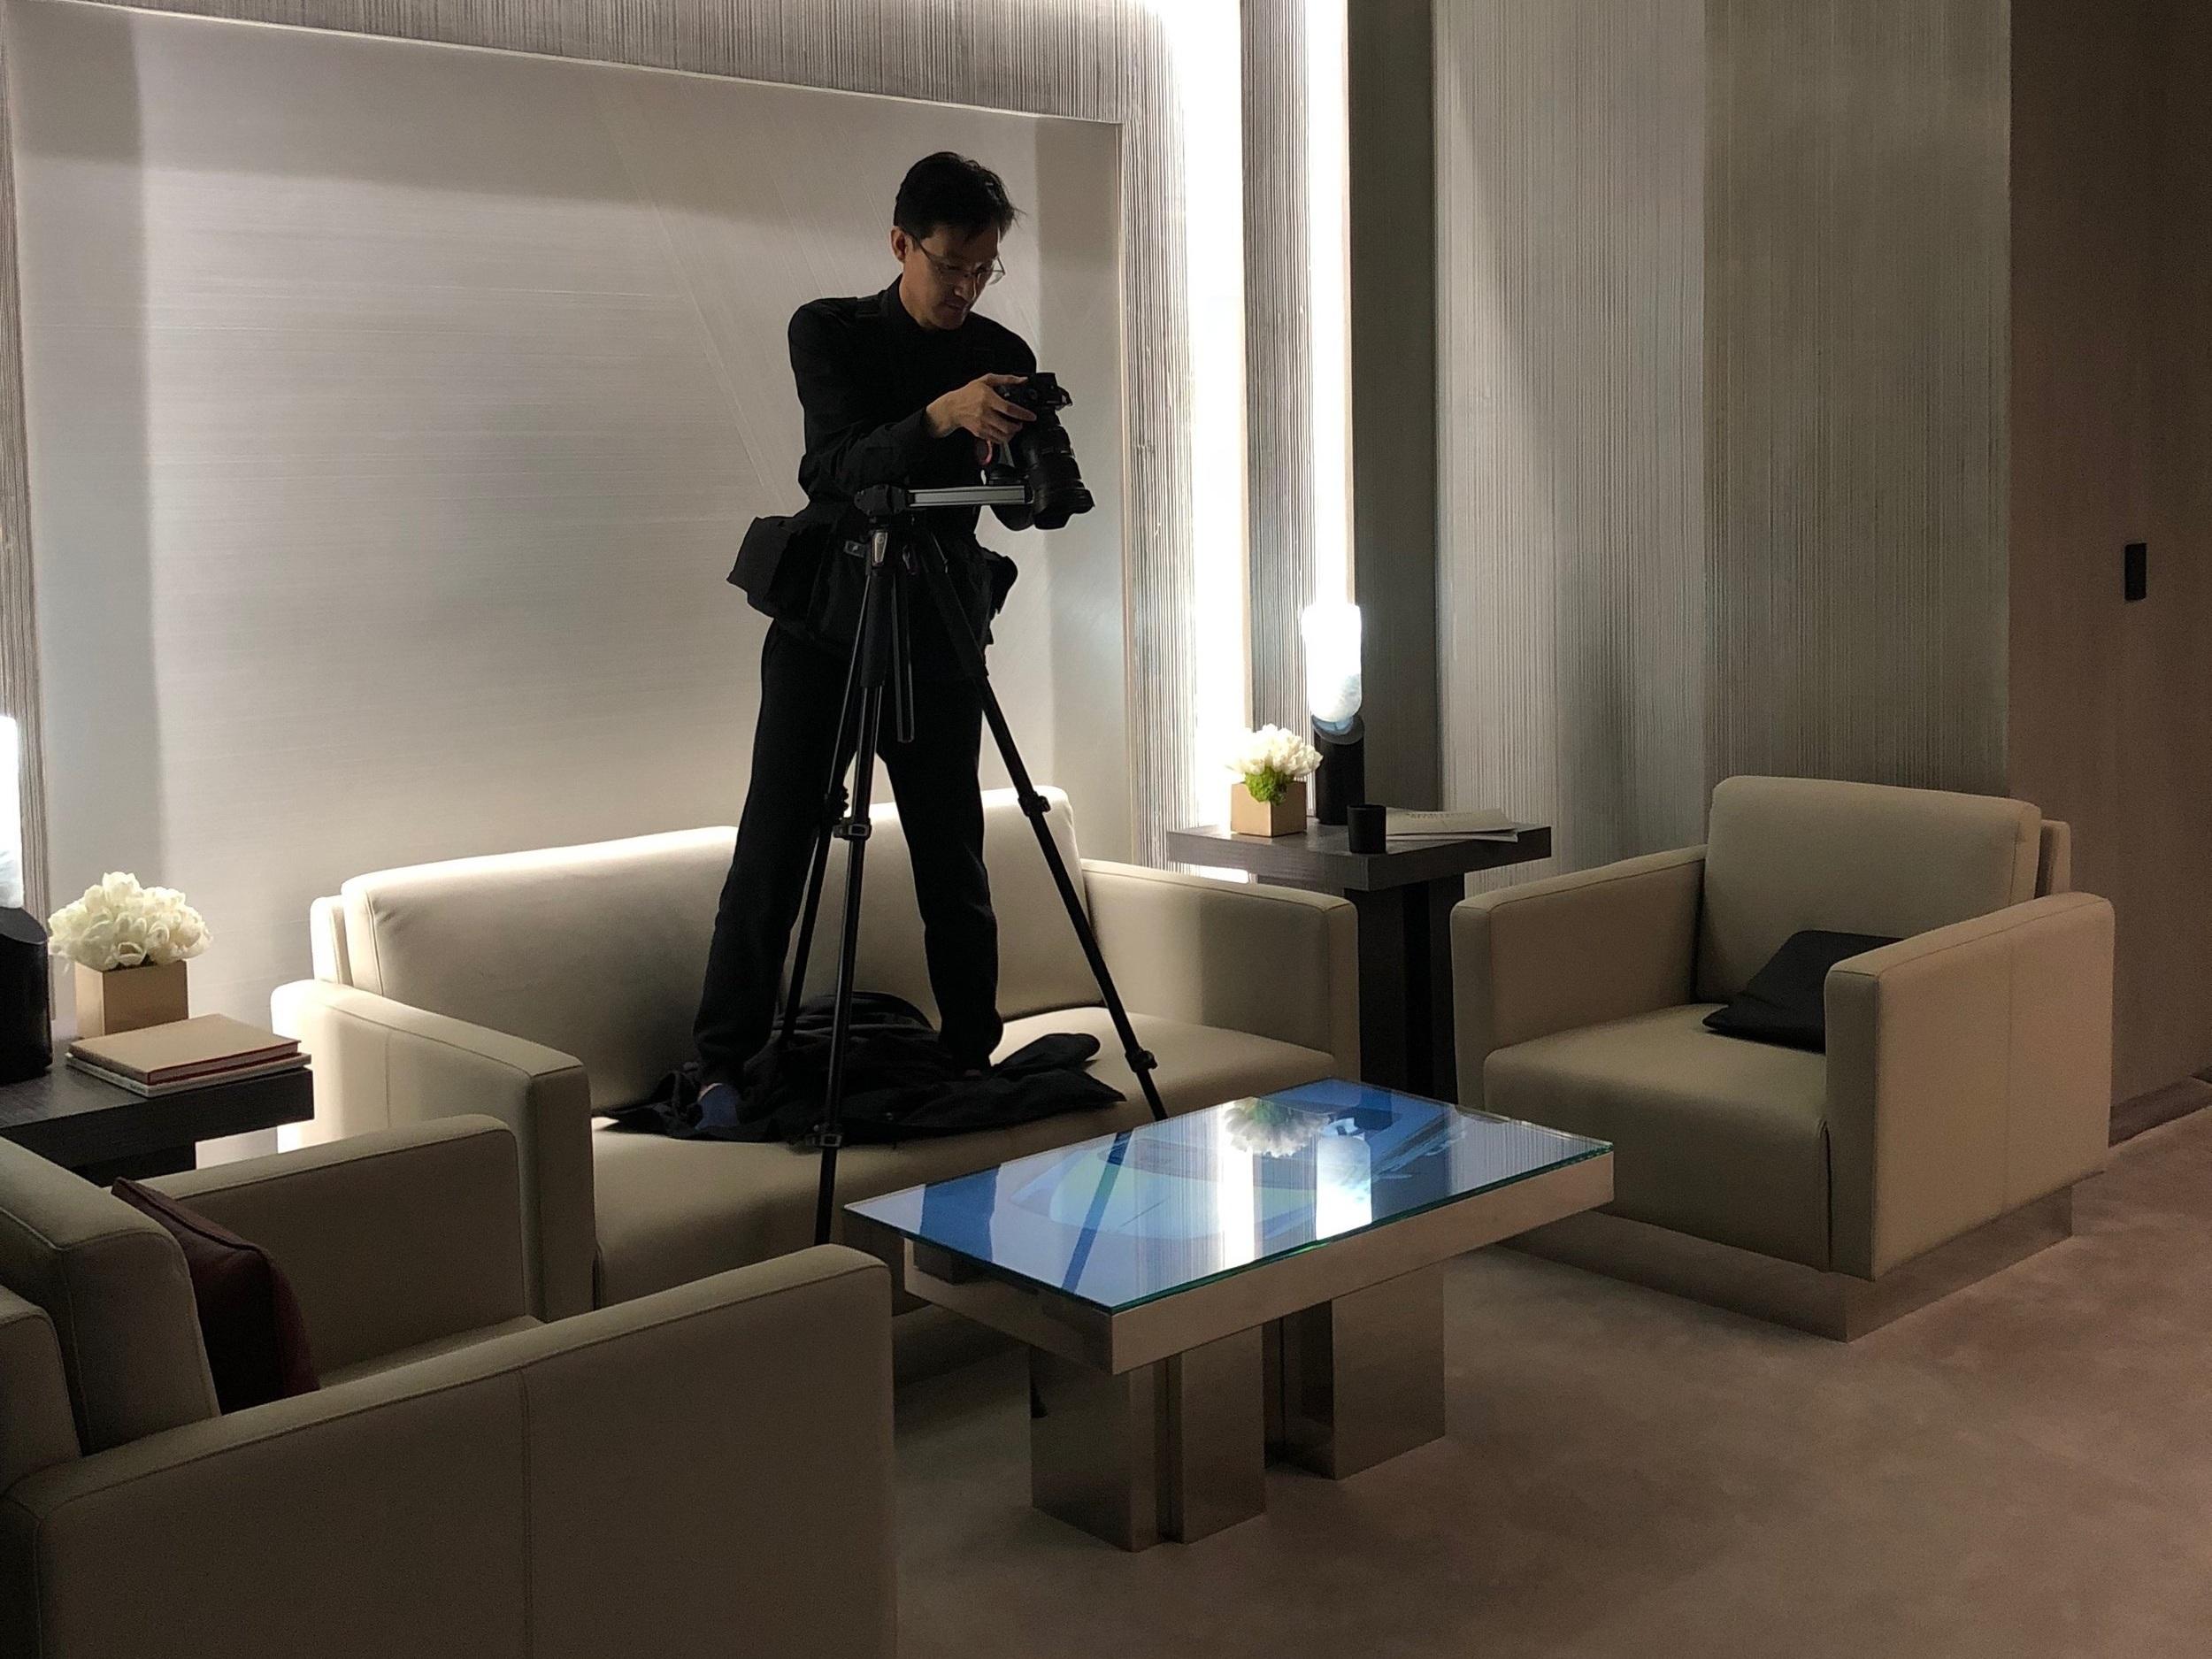 19_label_dalbin_table_video_rolls_royce_shanghai_7.jpg